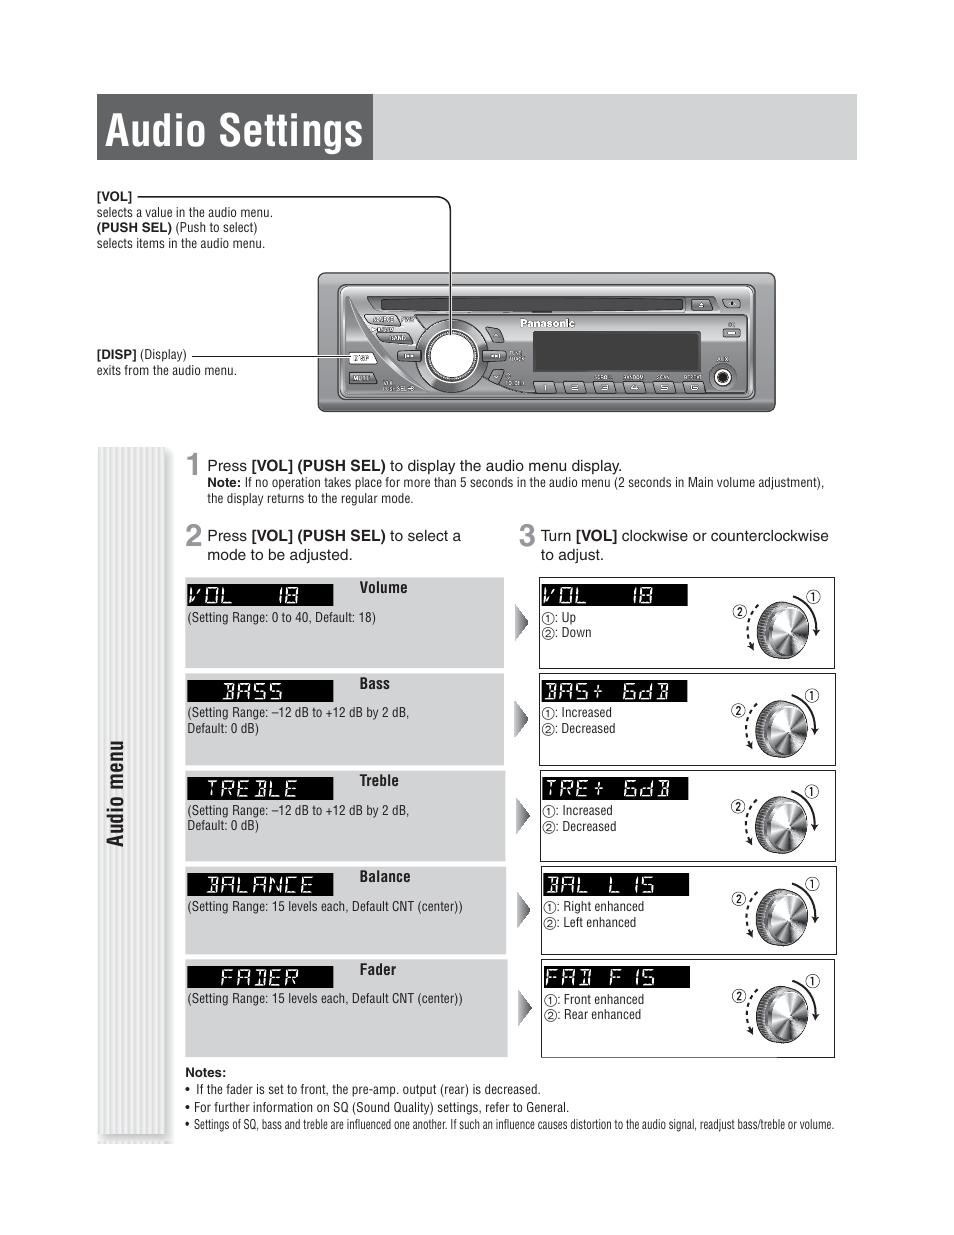 Panasonic Cq C1305u Wiring Diagram Library C7 Car Stereo Harness Audio Settings Menu C1305l User Manual Page 15